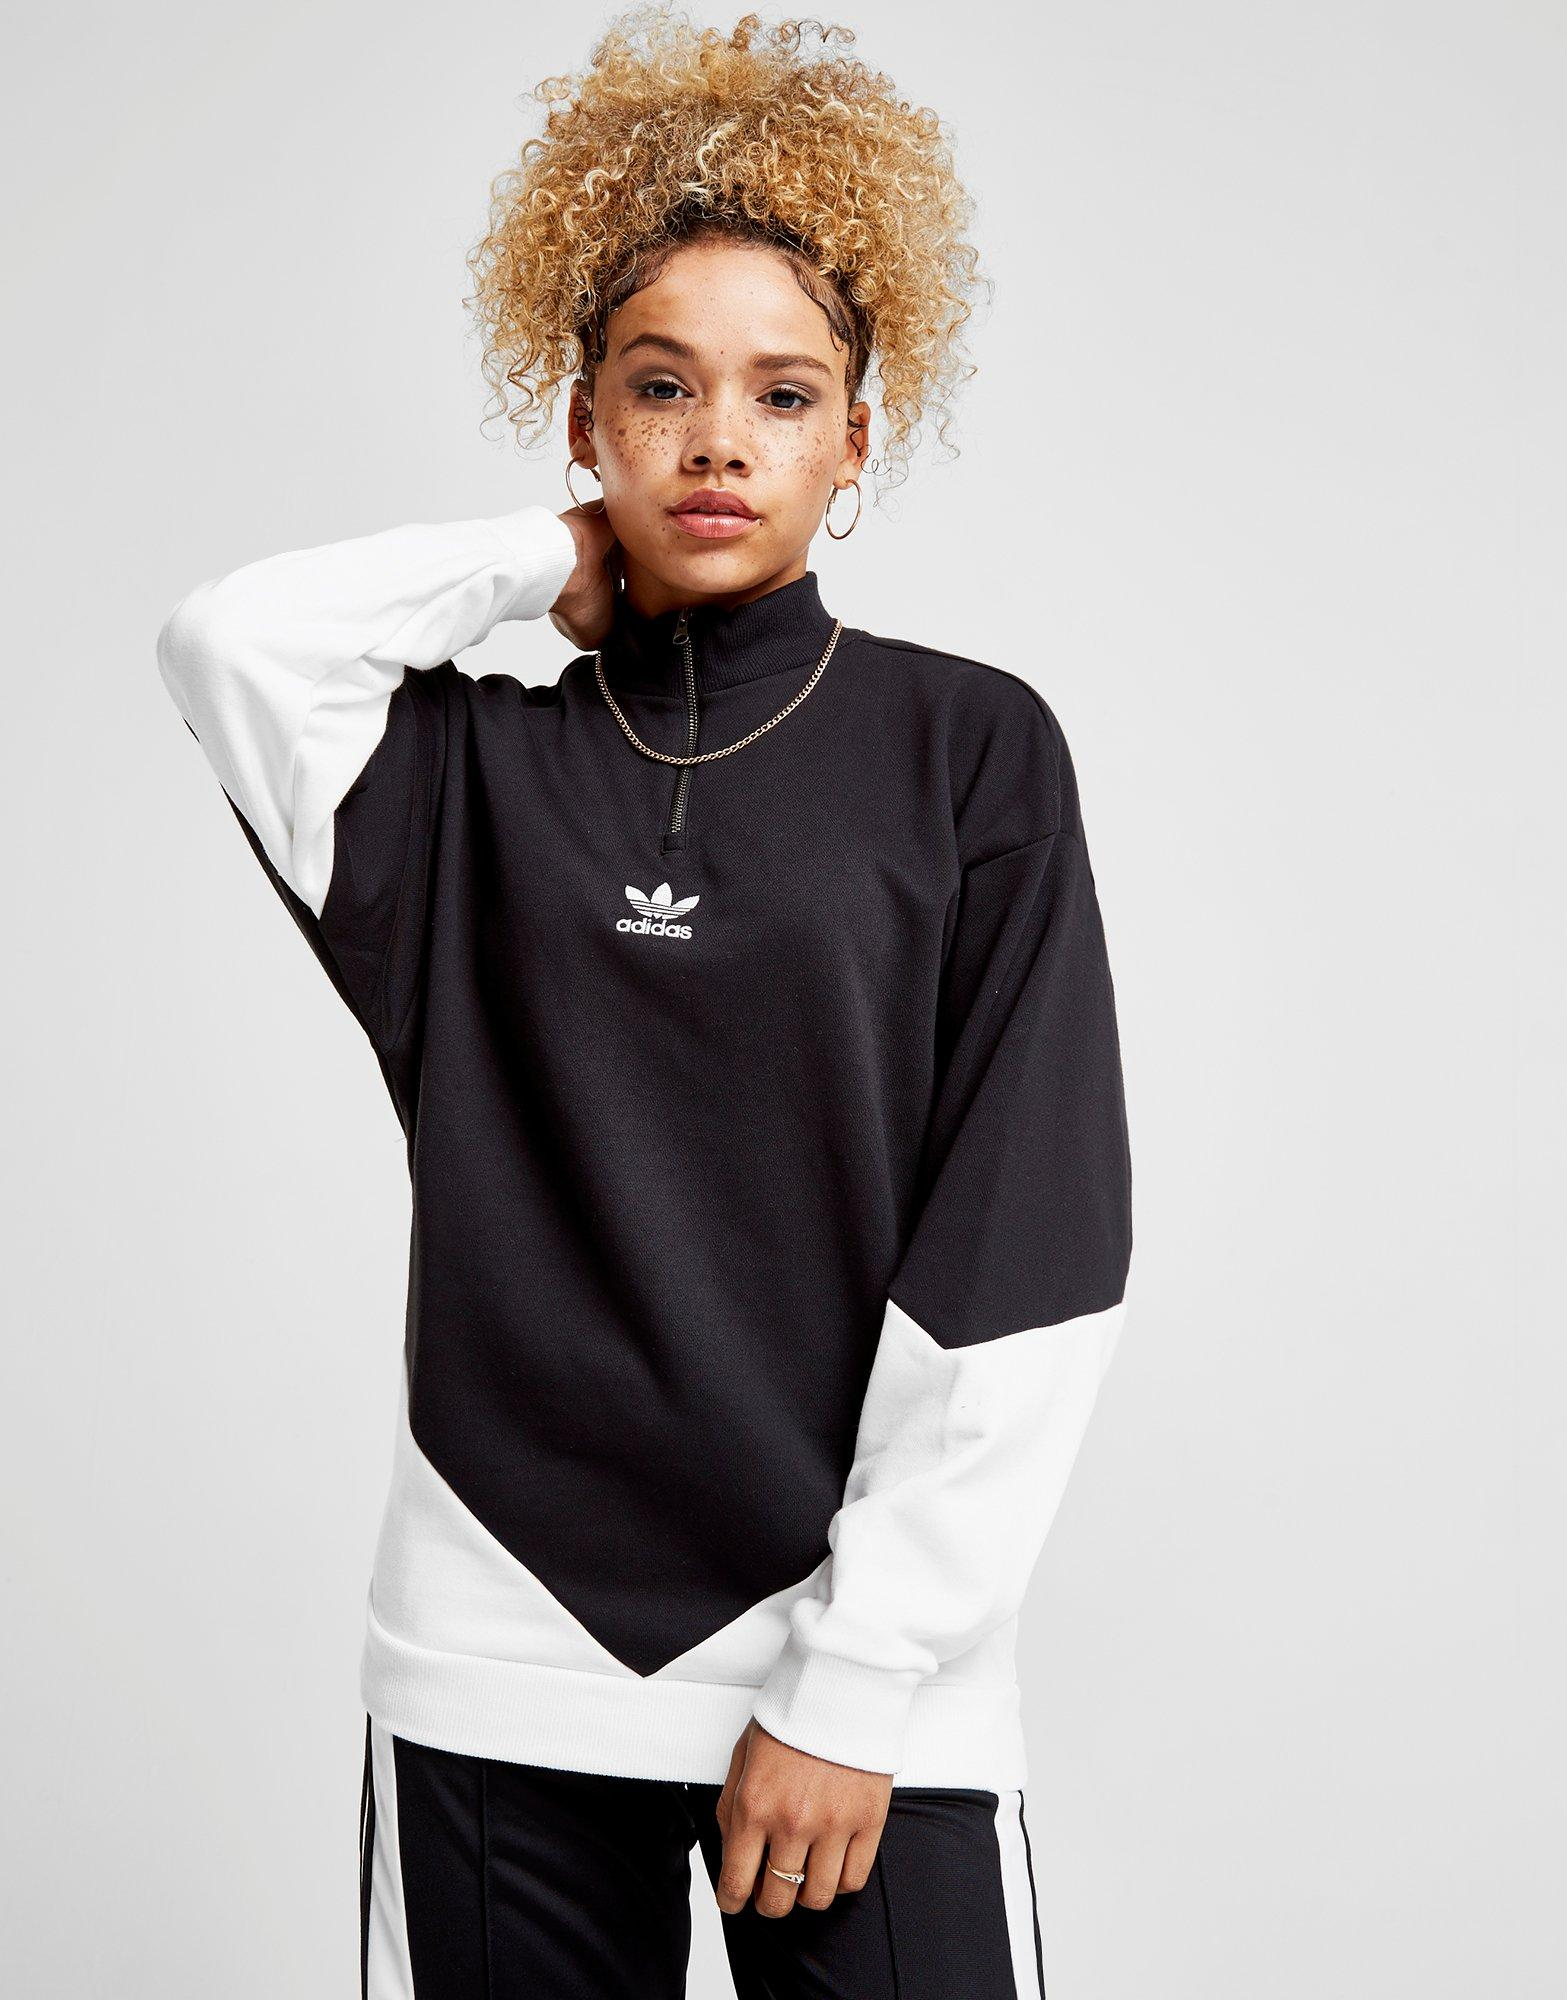 Adidas Originals Colorado 12 Zip Top Dames  Jd Sports